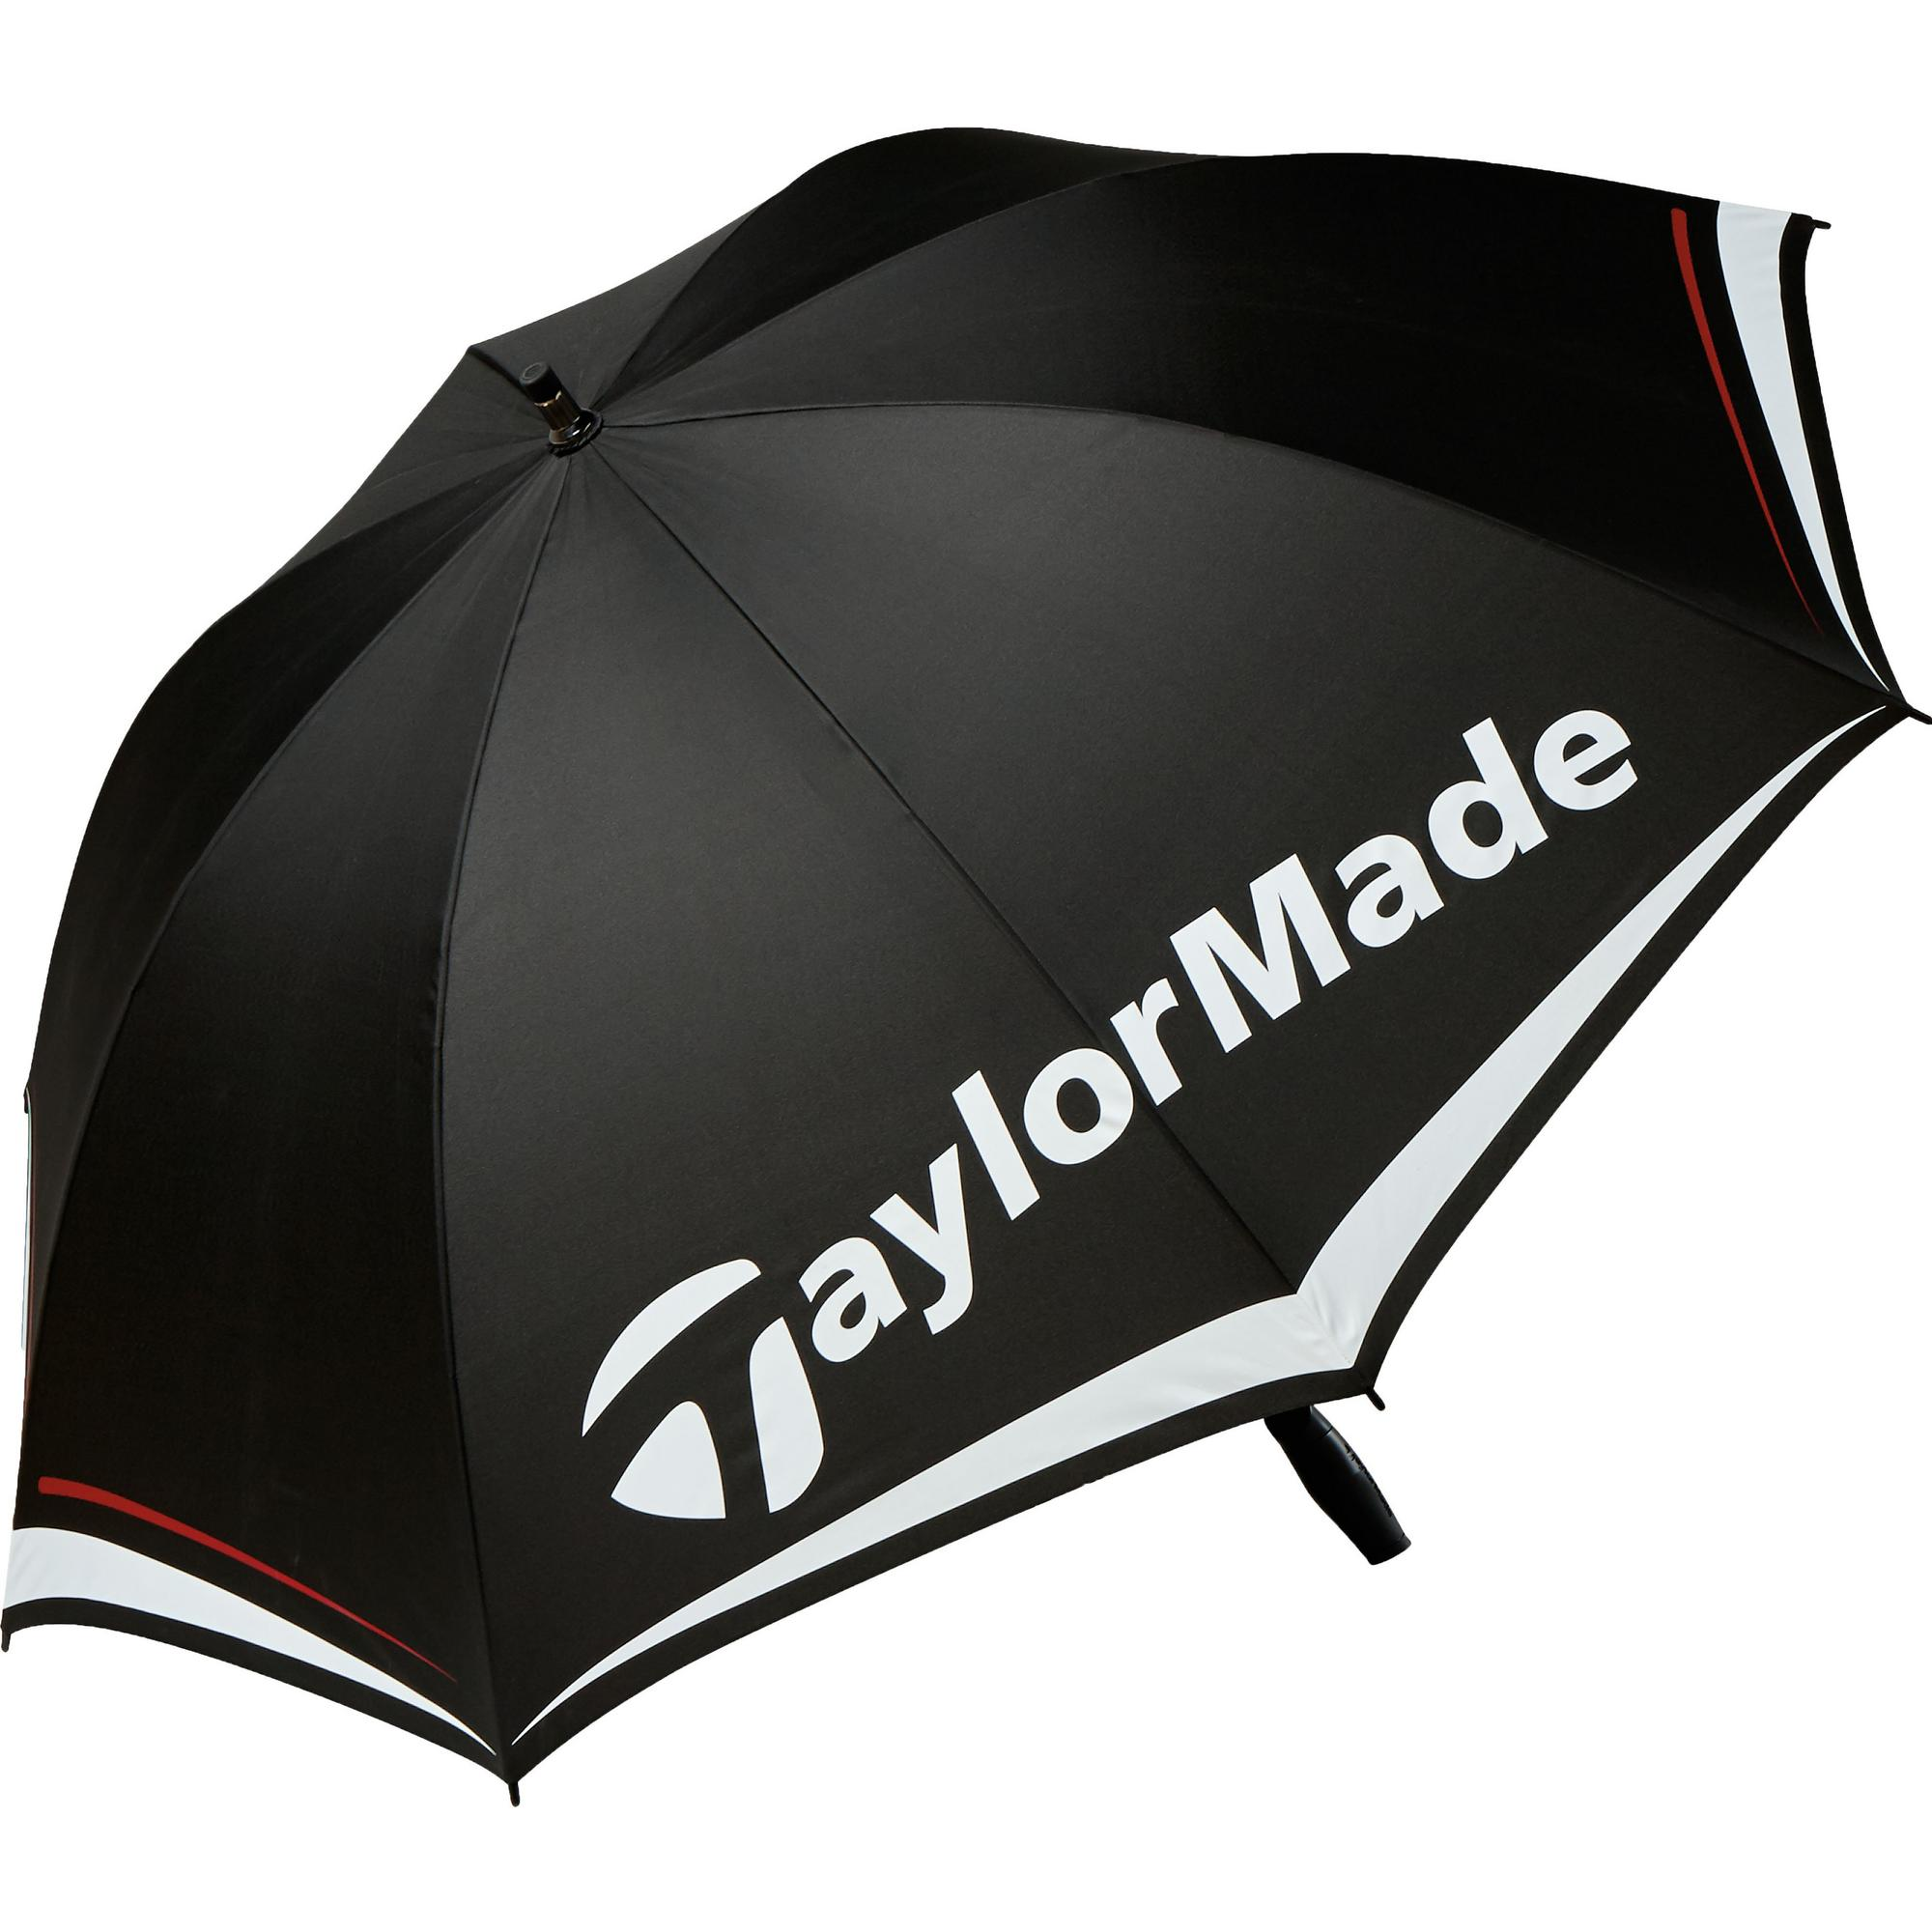 TM Single Canopy Umbrella